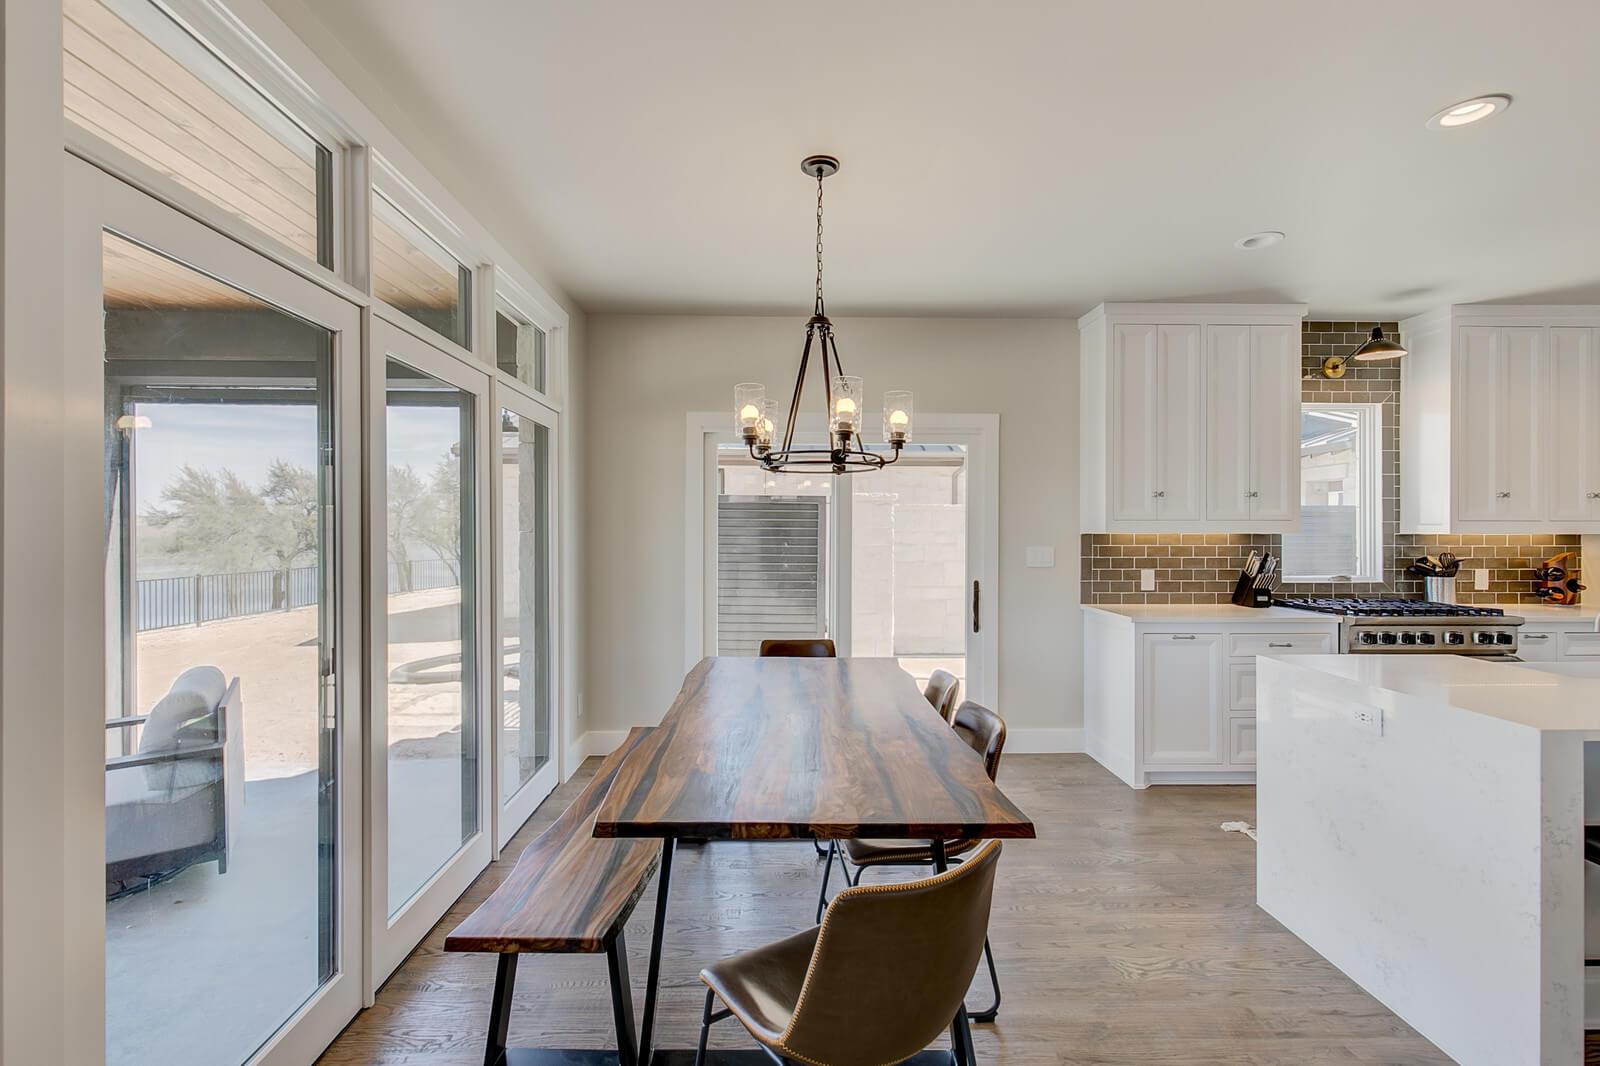 Steve-Bumpas-Custom-Homes-The-Residences-at-Rough-Creek-Lodge-Beck-74.jpg